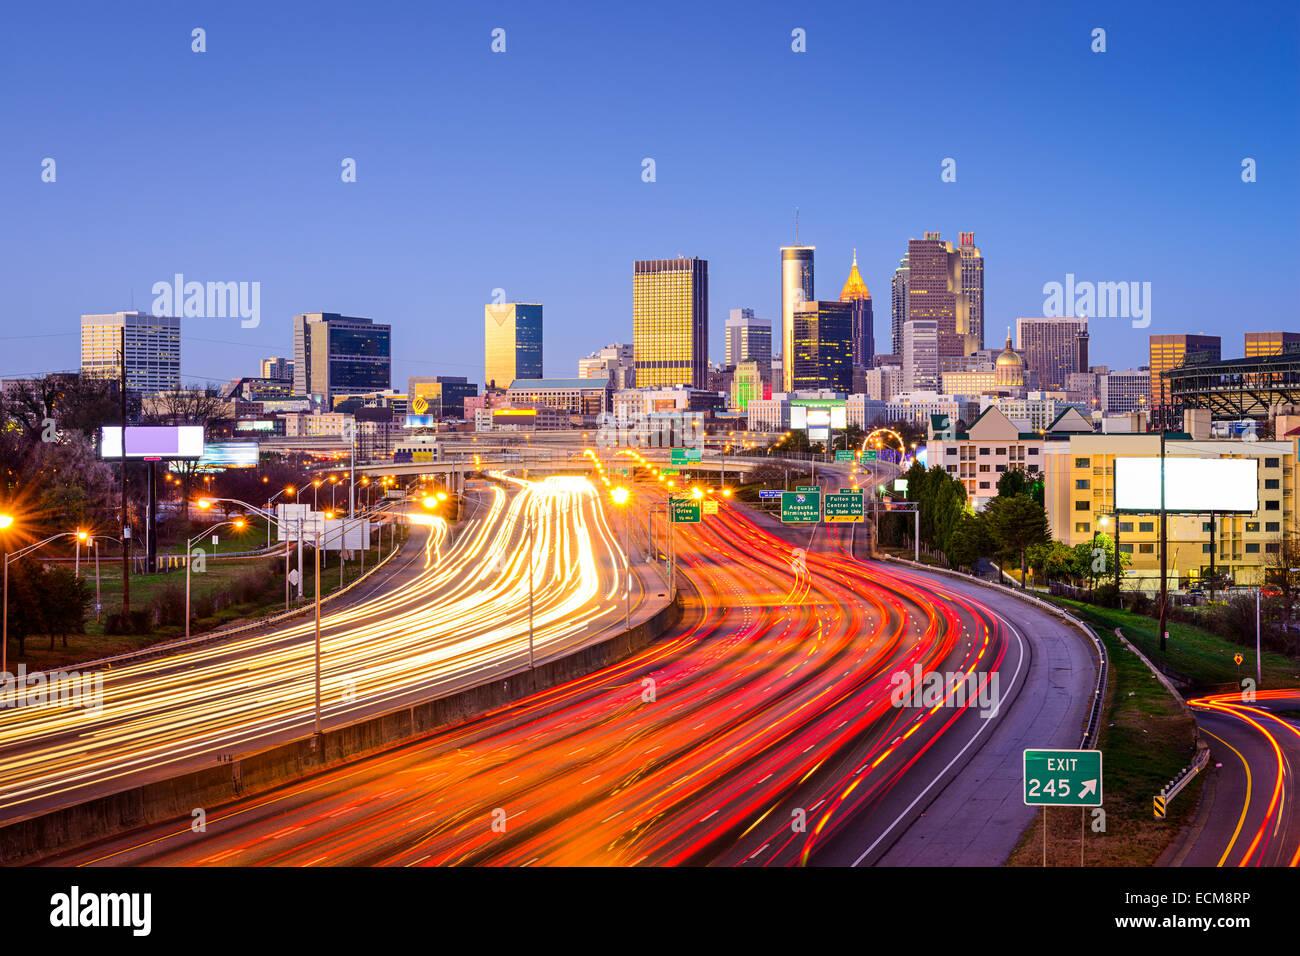 Atlanta, Georgia, USA downtown city skyline over the interstate highway. Stock Photo